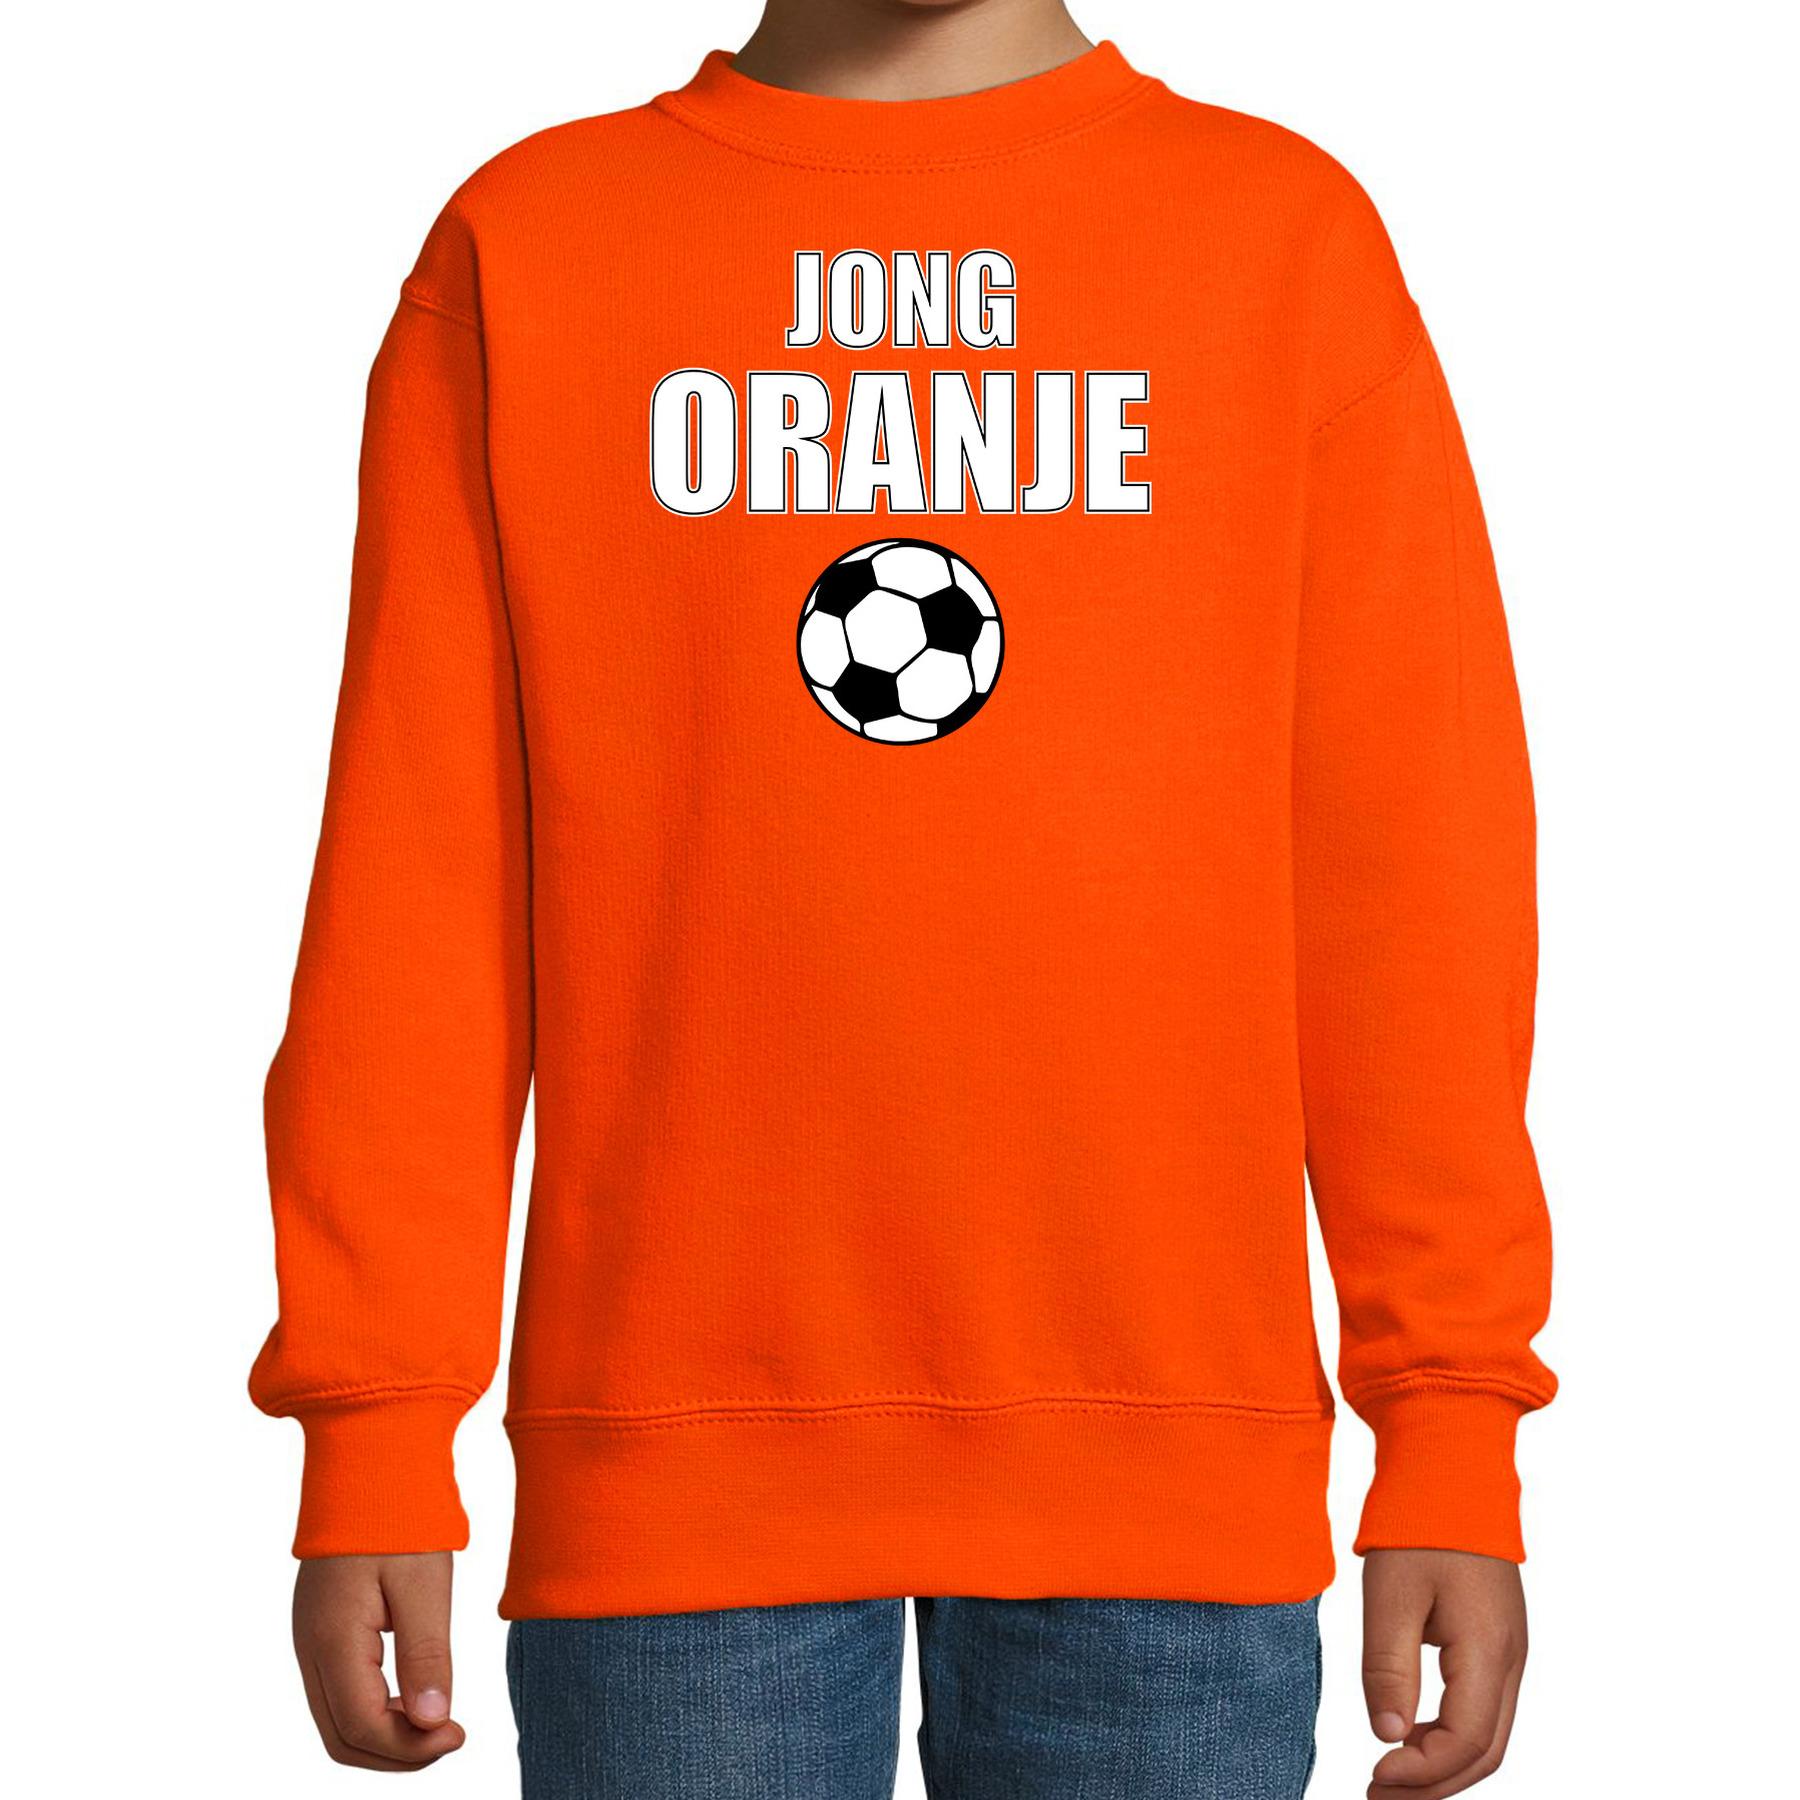 Jong oranje sweater - trui Holland - Nederland supporter EK/ WK fan oranje voor kinderen